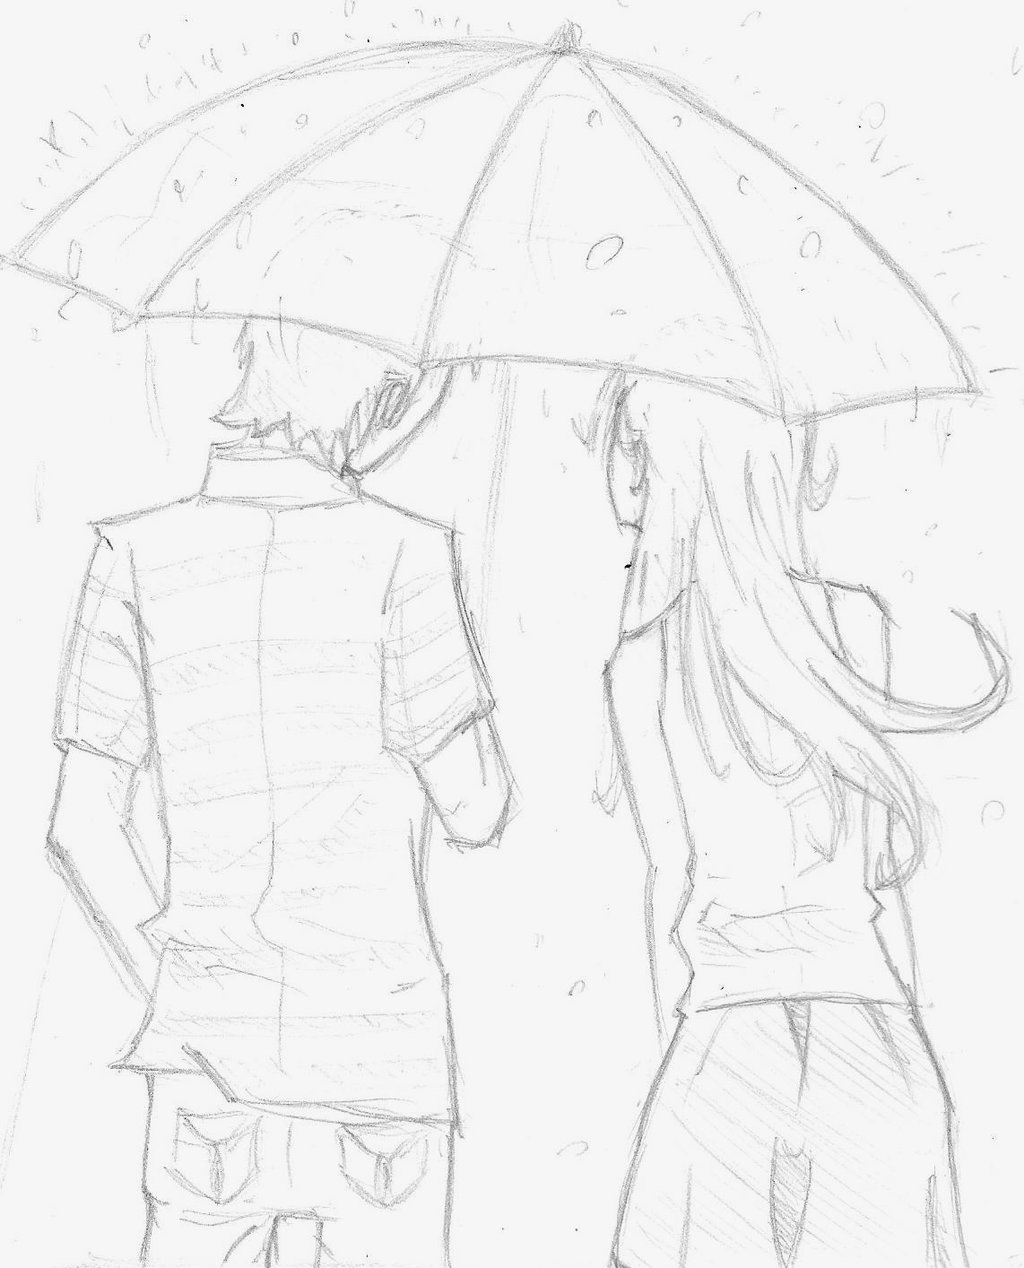 1024x1268 Pencil Sketch Couple Pics In The Rain Cycle Rain Couple Pencil